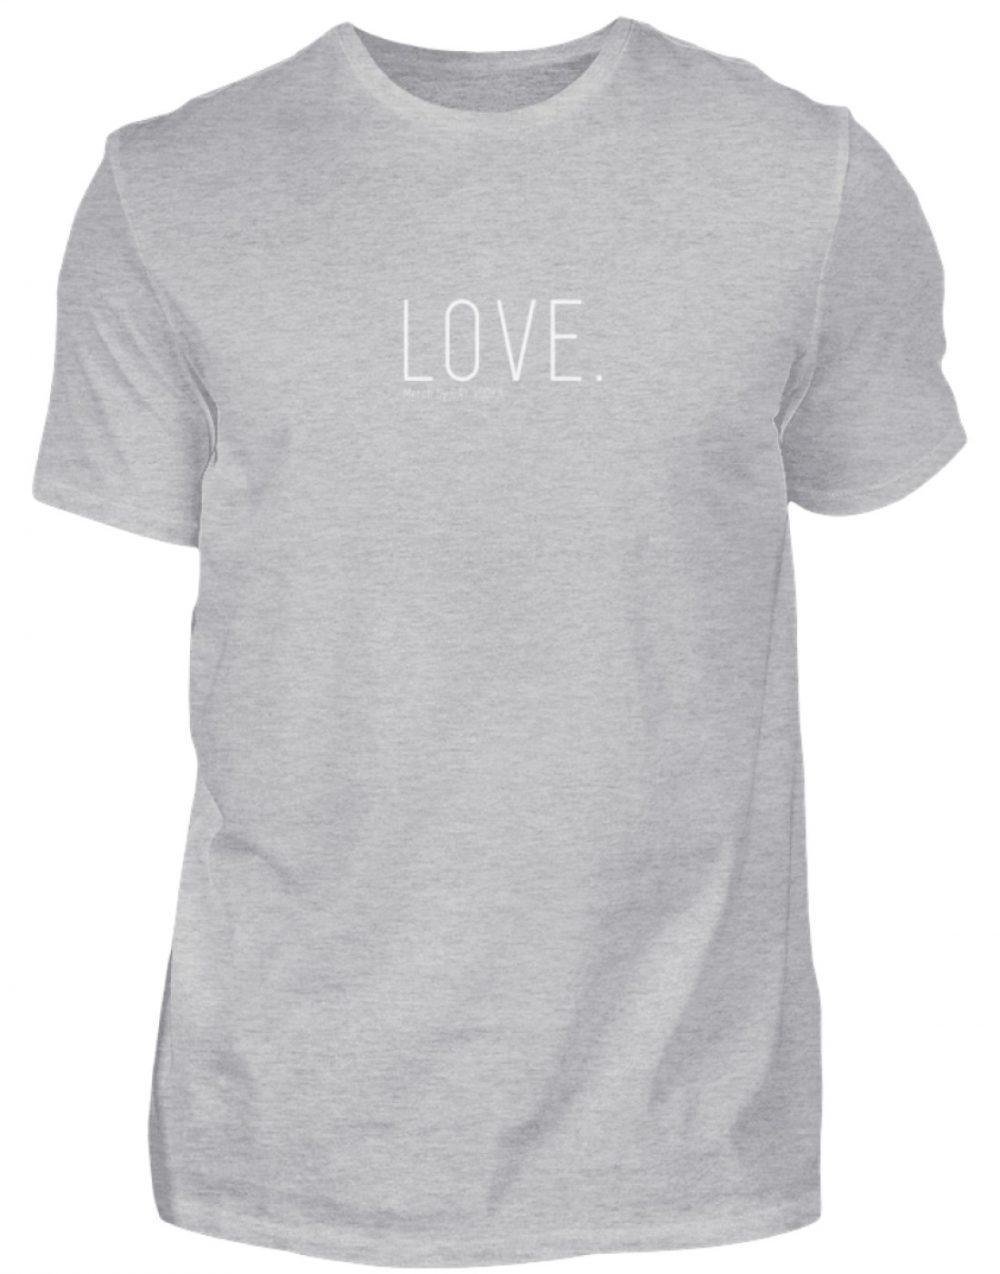 LOVE. - Herren Shirt-17